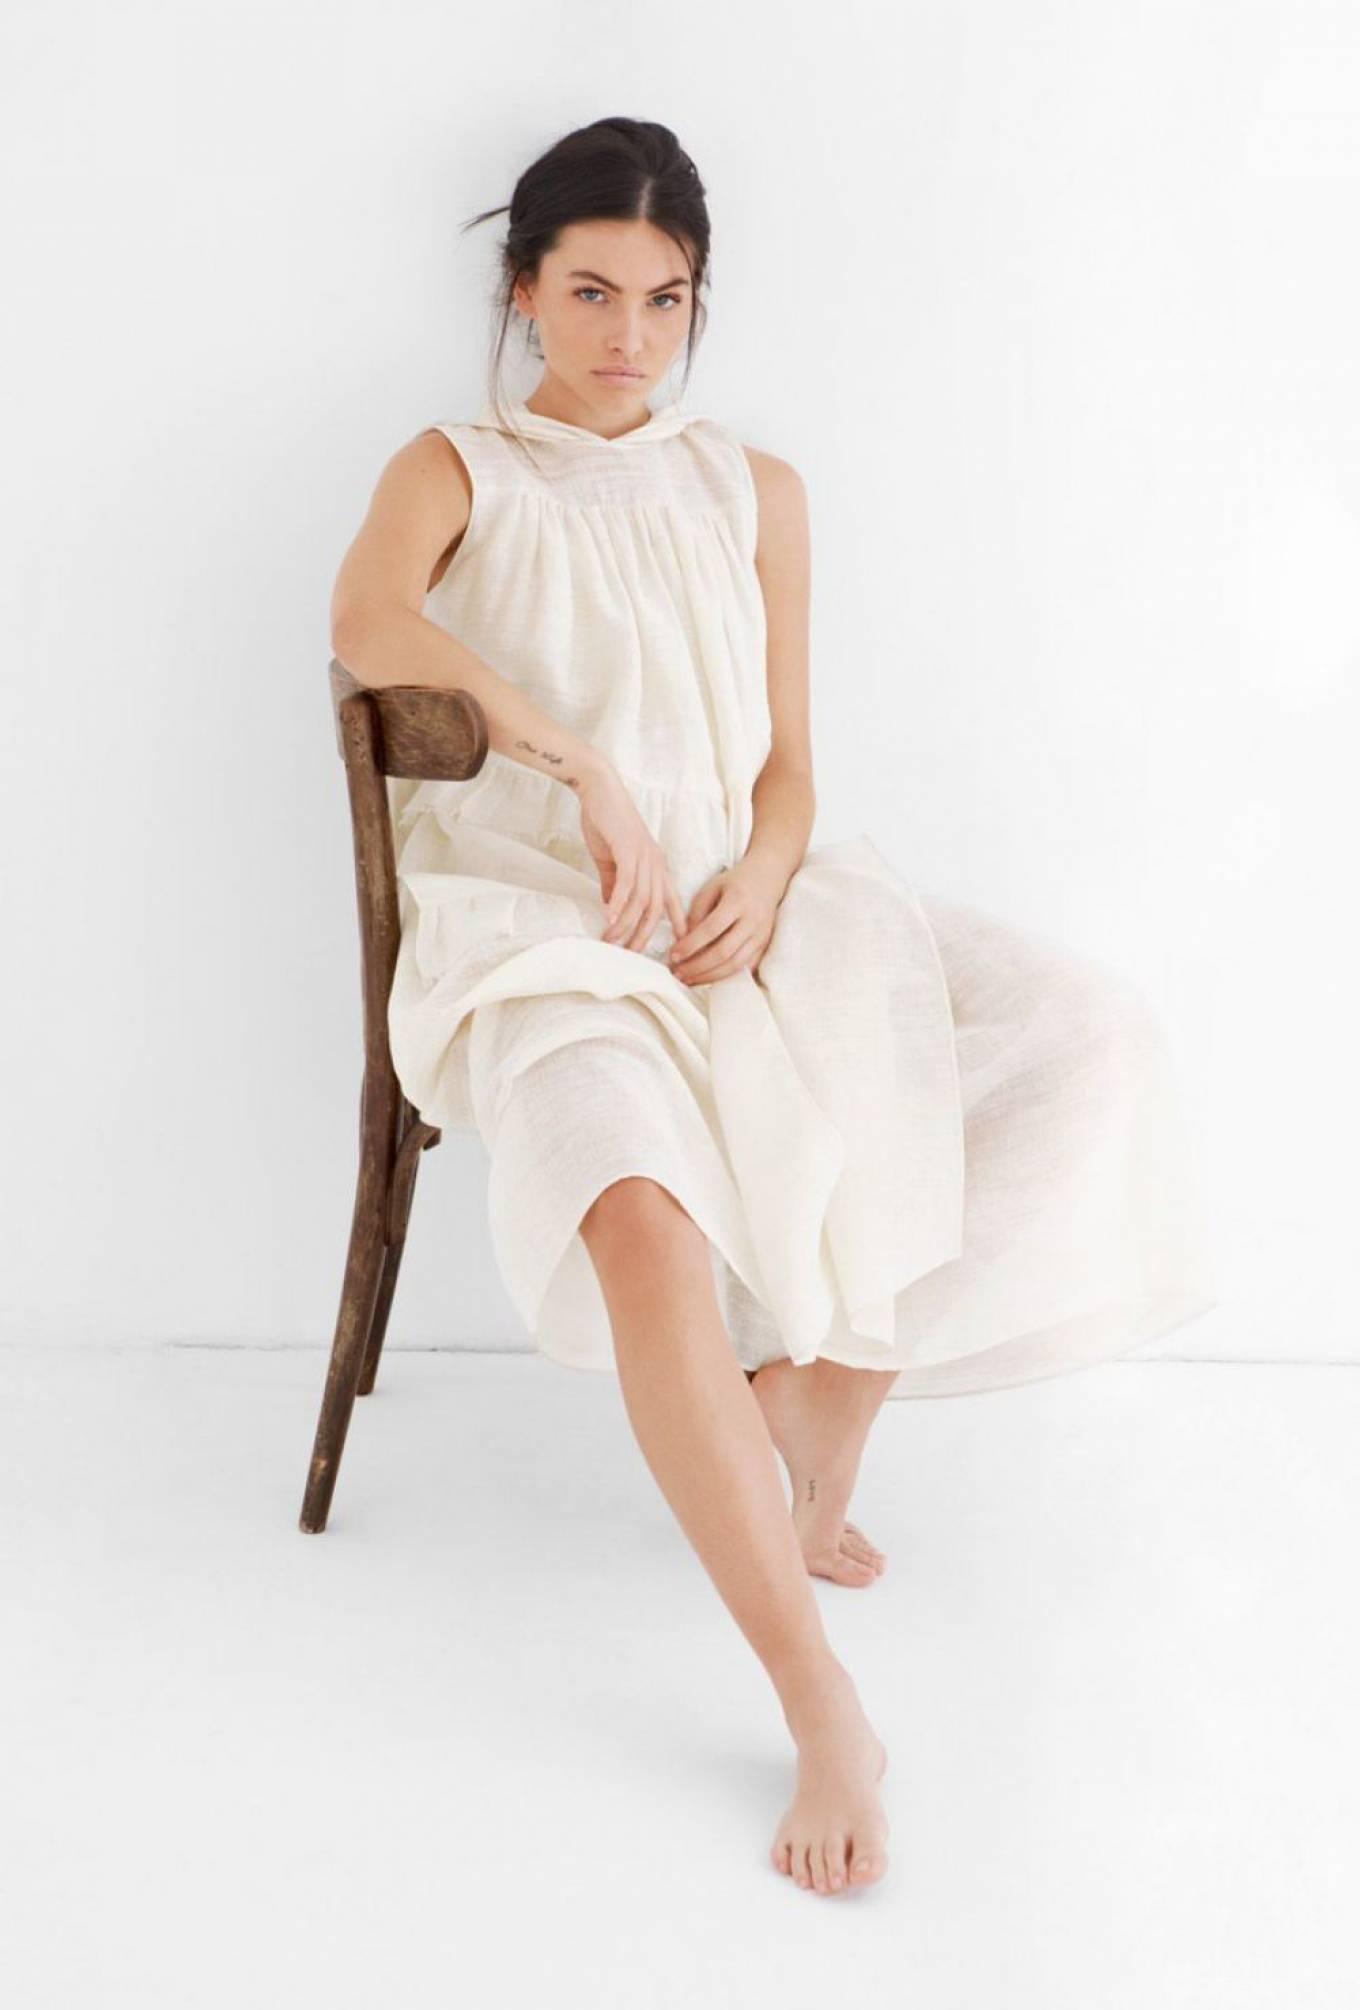 Thylane Blondeau 2020 : Thylane Blondeau – Harper's Bazaar Magazine (Kazakhstan – July 2020)-04